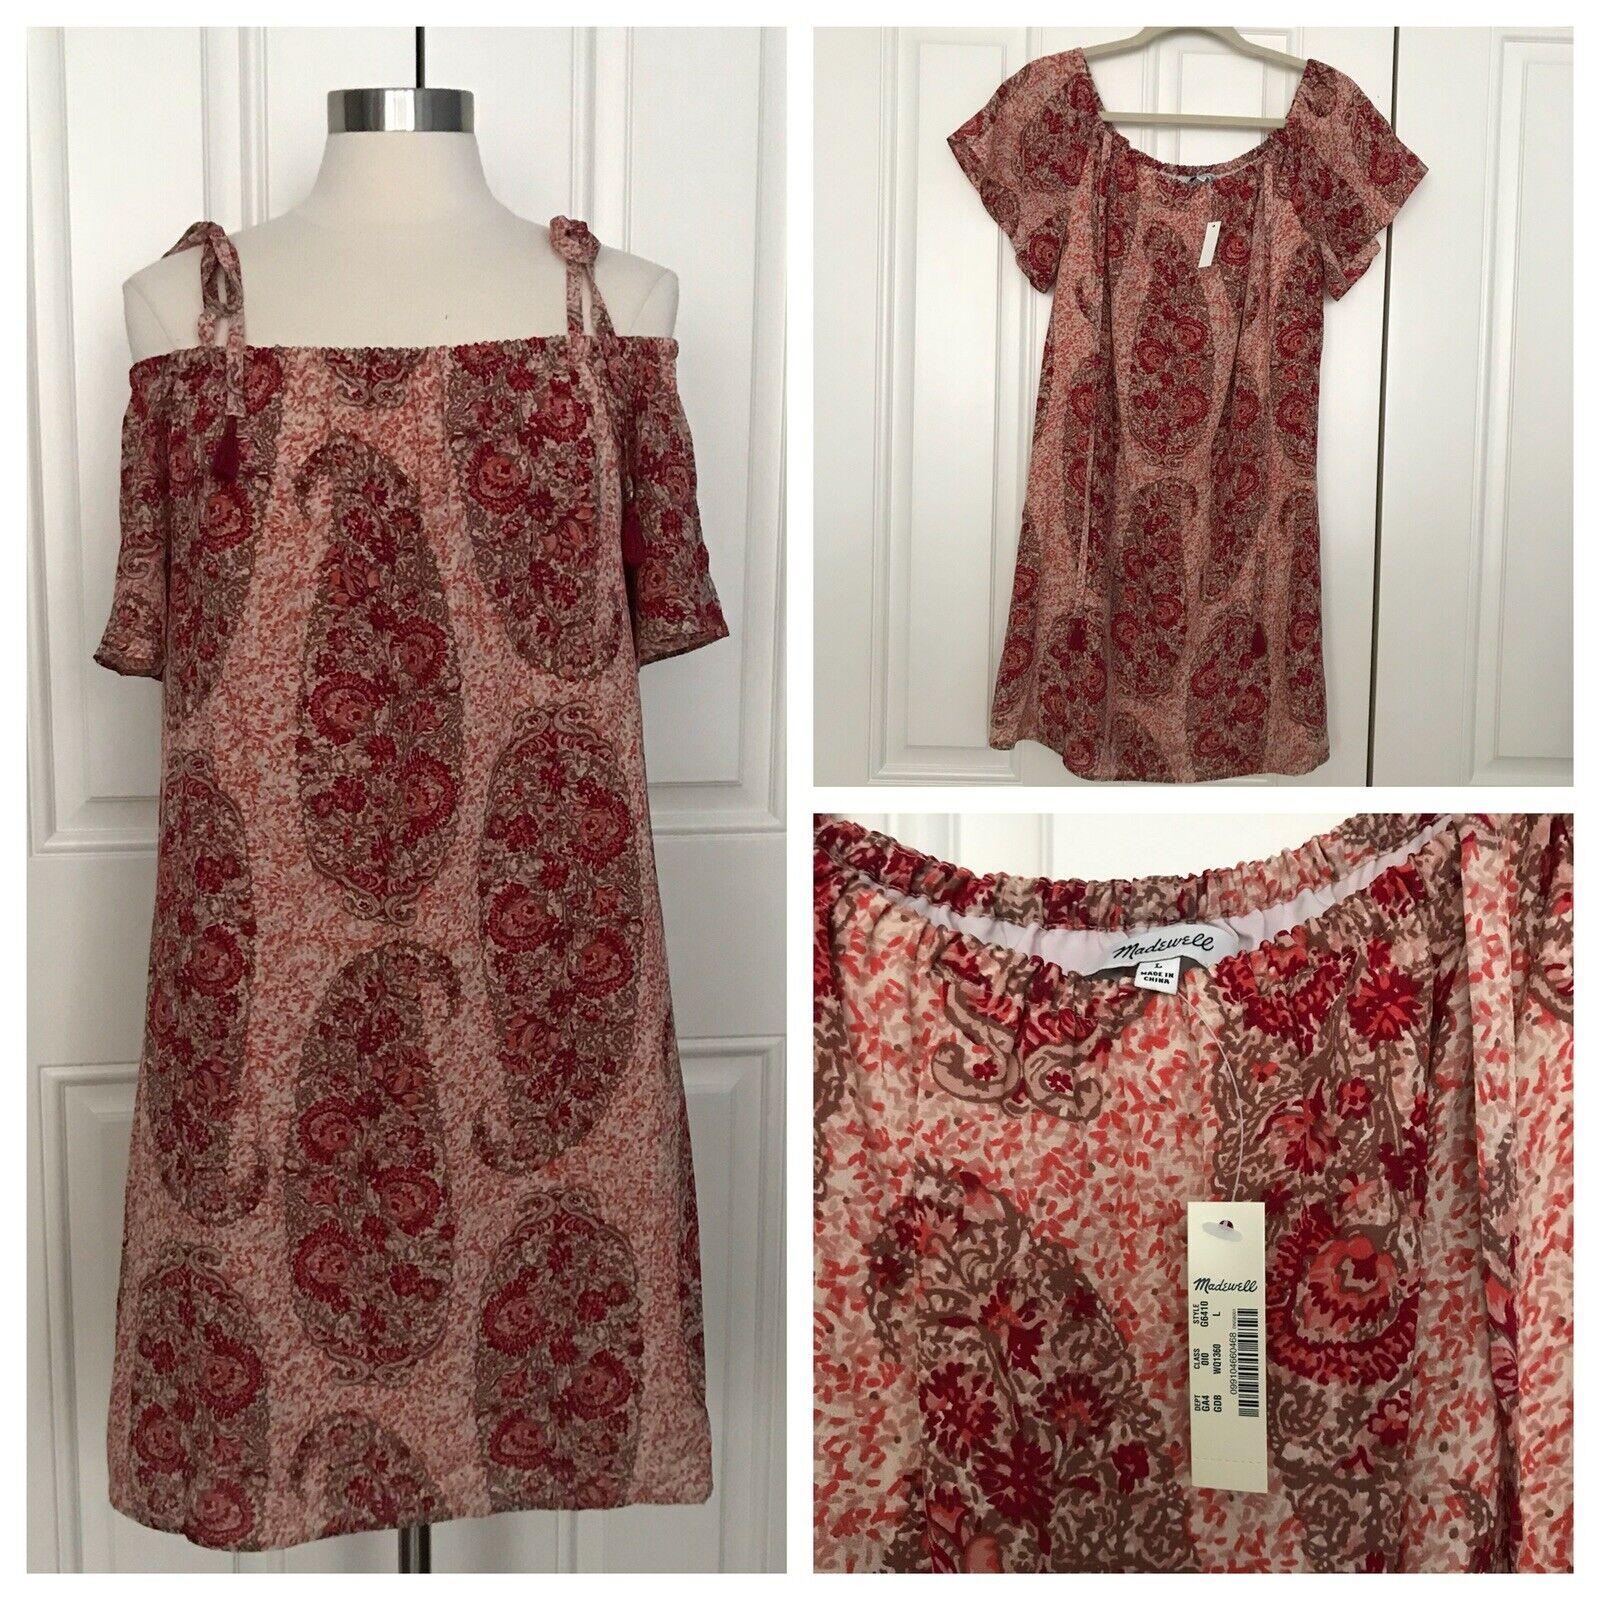 NWT Madewell Paisley Silk Cold-shoulder Dress Tunic G6410 damen L MSRP